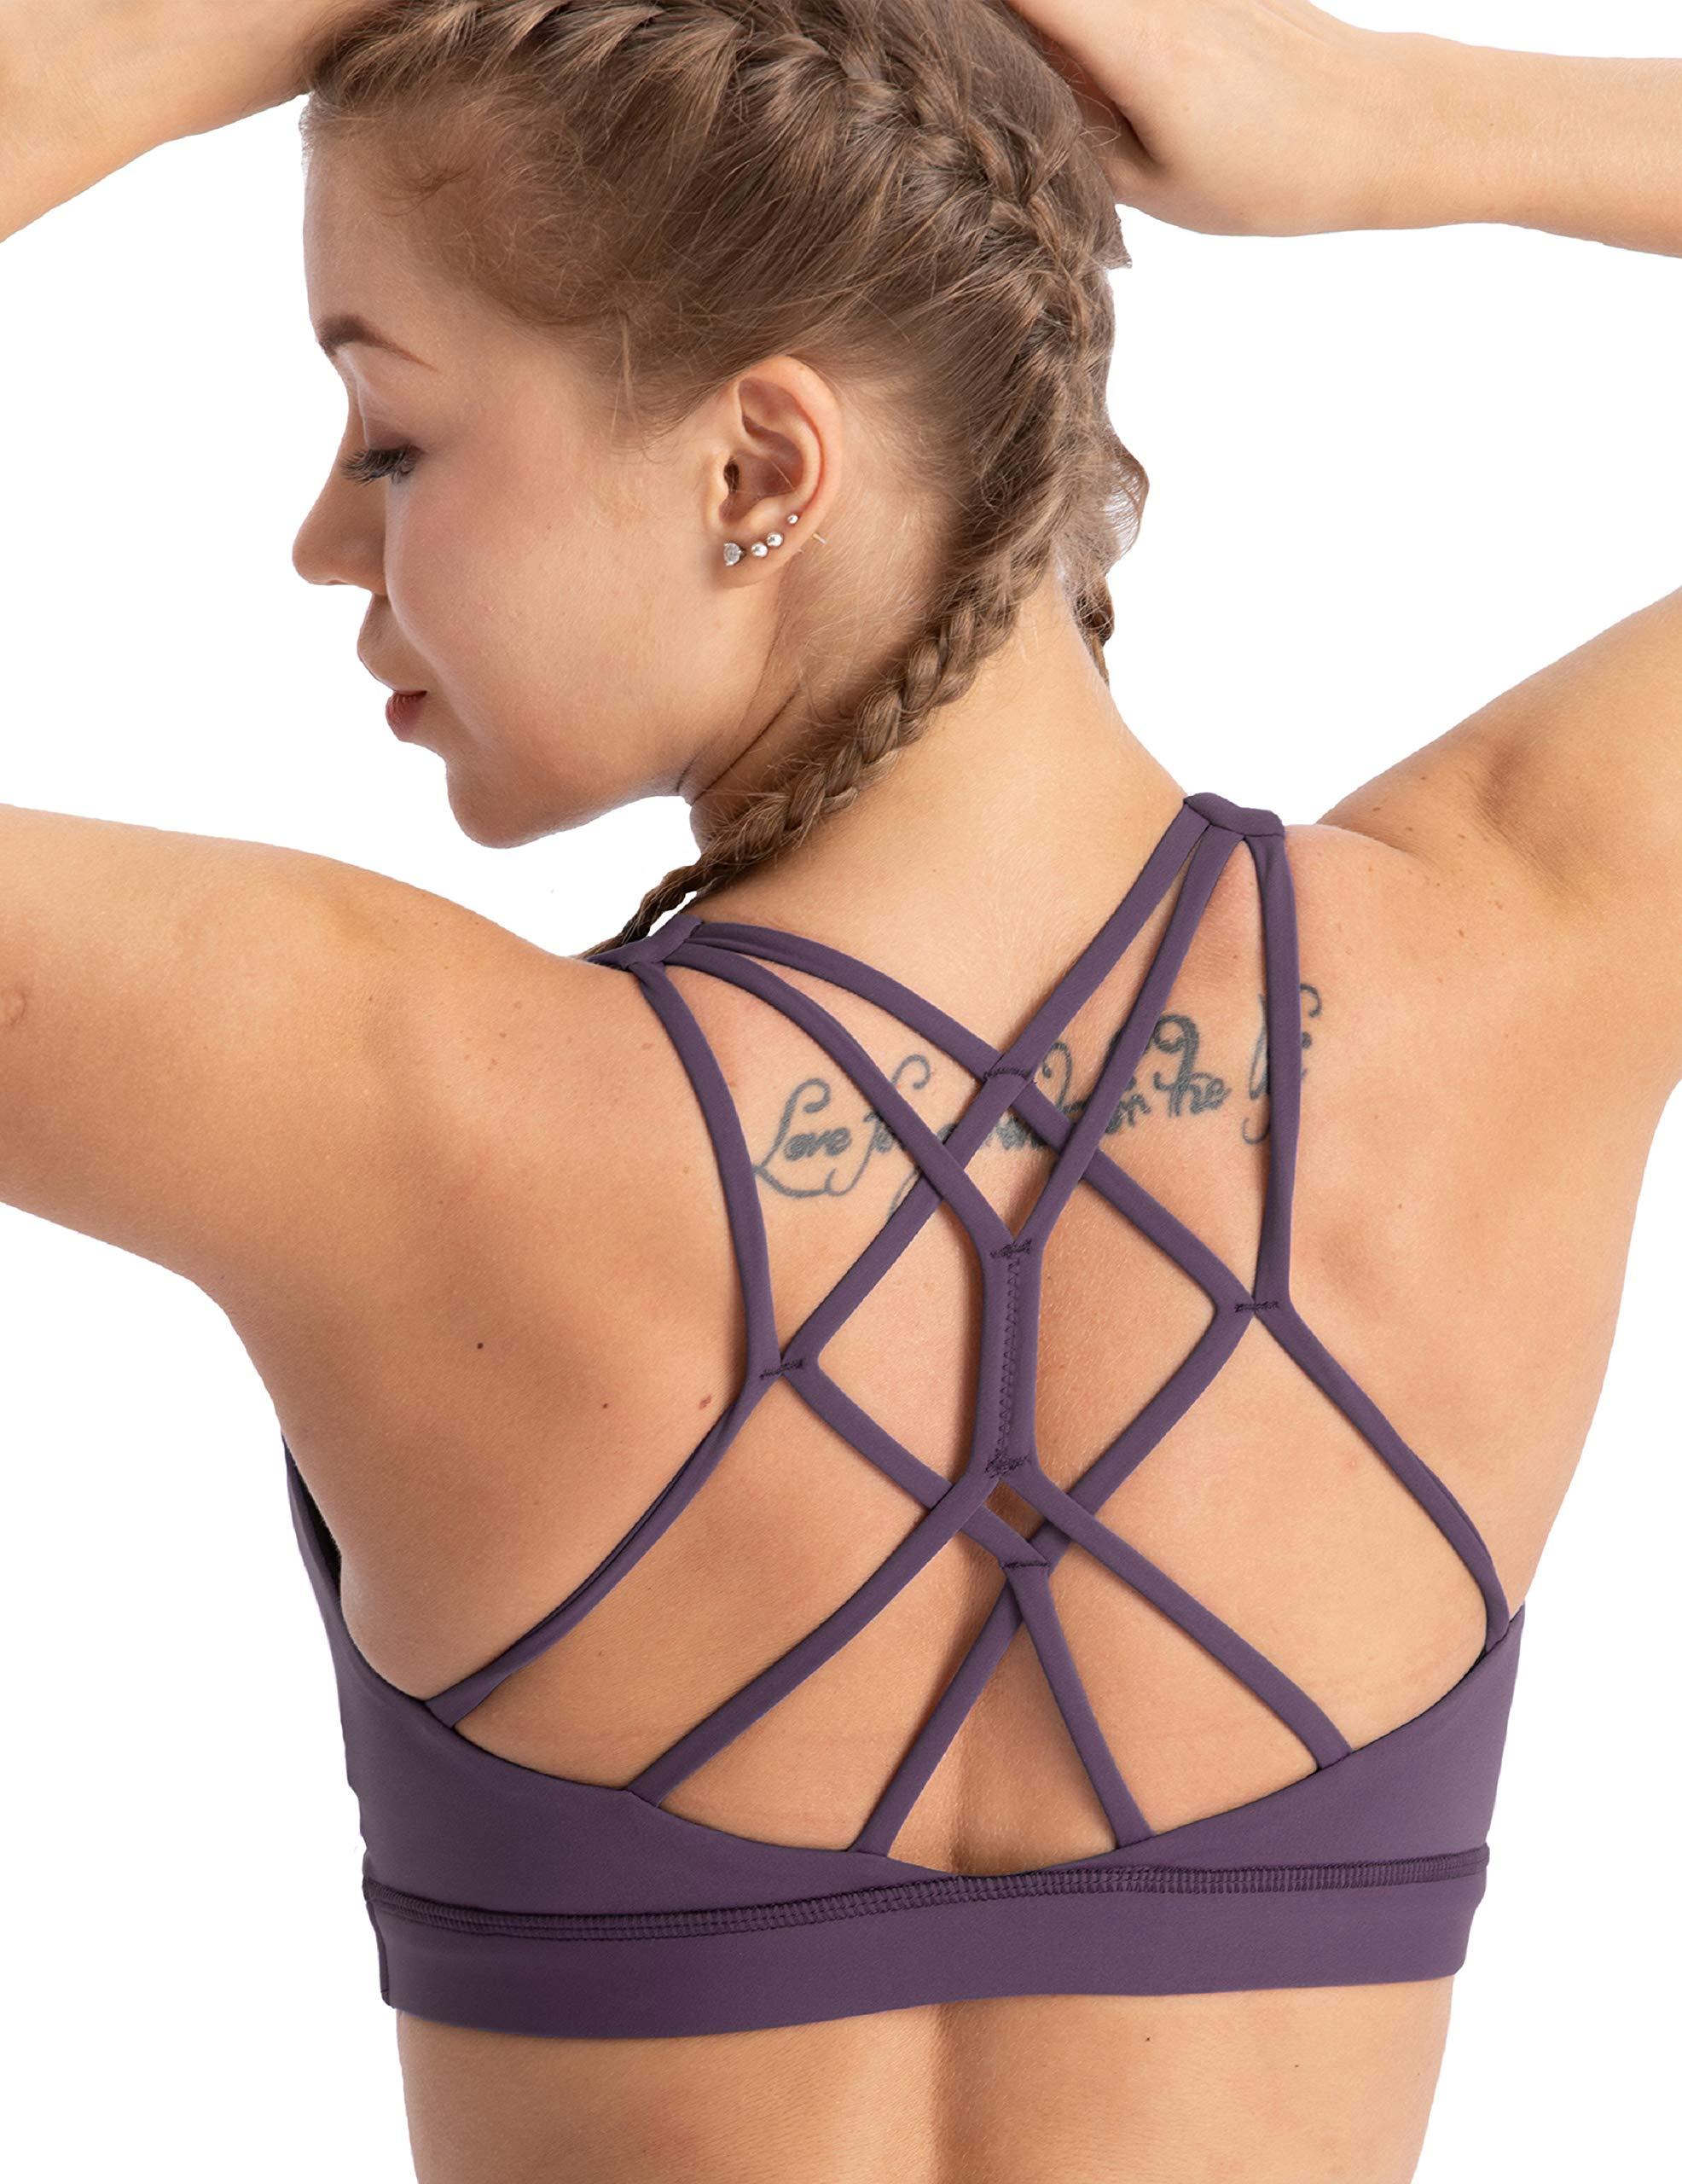 coastal rose Women's Yoga Bra Top Strappy Back Push Up Crop Sports Bra Activewear US XS BlackBerry Cordial by coastal rose